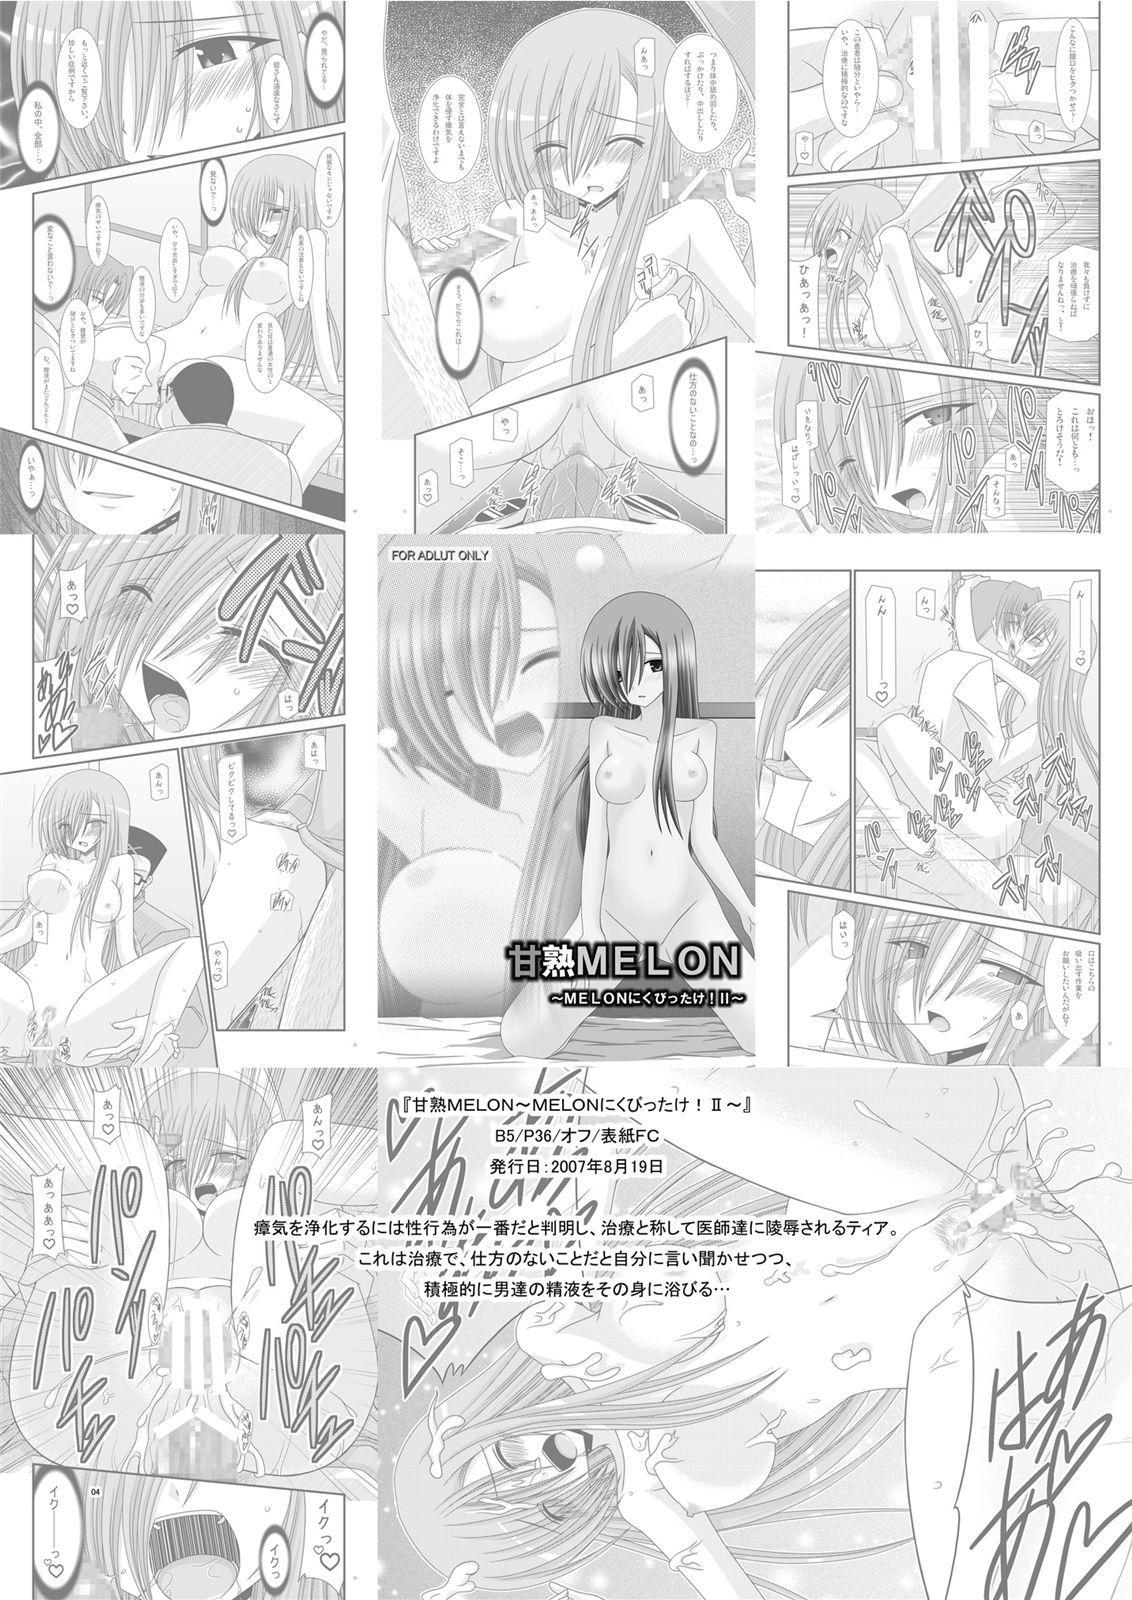 MELON ni Kubittake! III 3